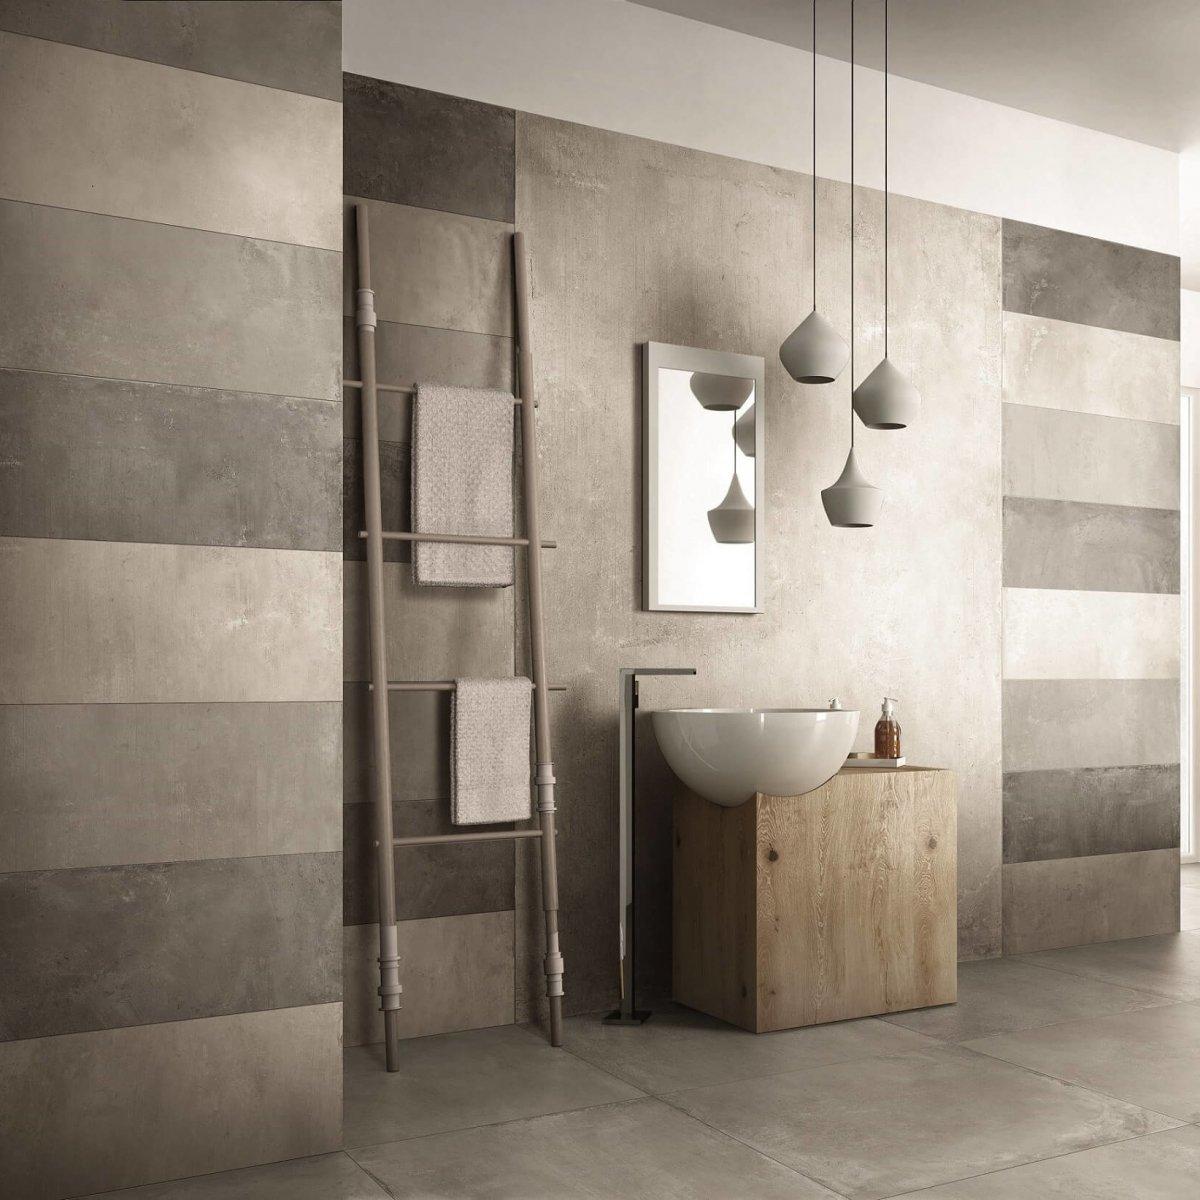 Florim Beton One Chalk 600x600mm_Stiles_Lifestyle_Image5